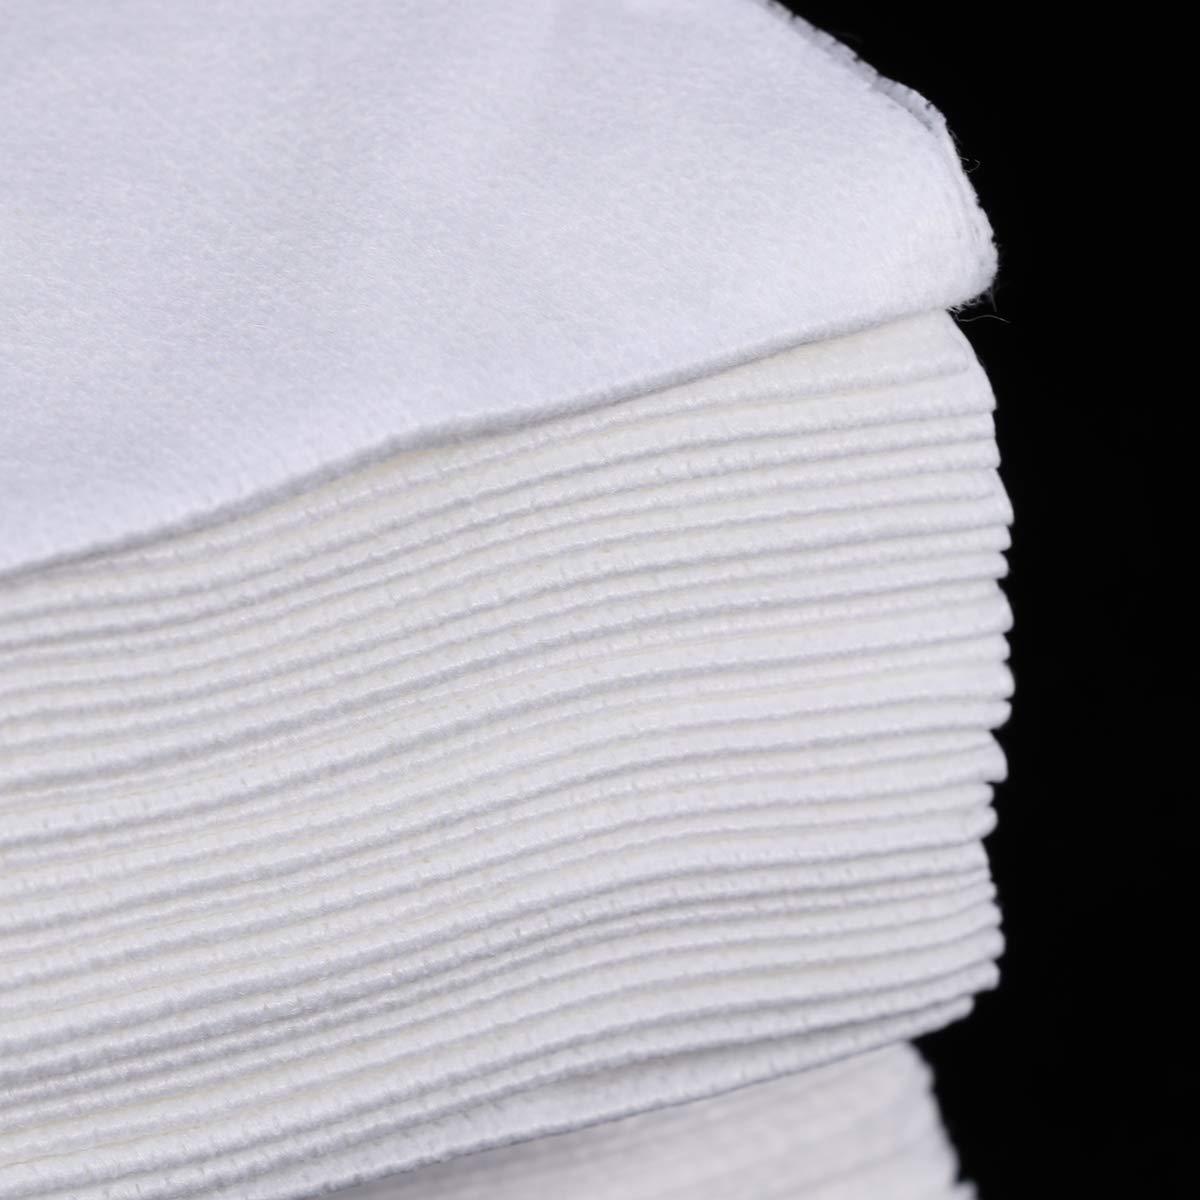 SUPVOX Tatuaje desechable Limpie Papel Toalla de papel Tissue Body ...